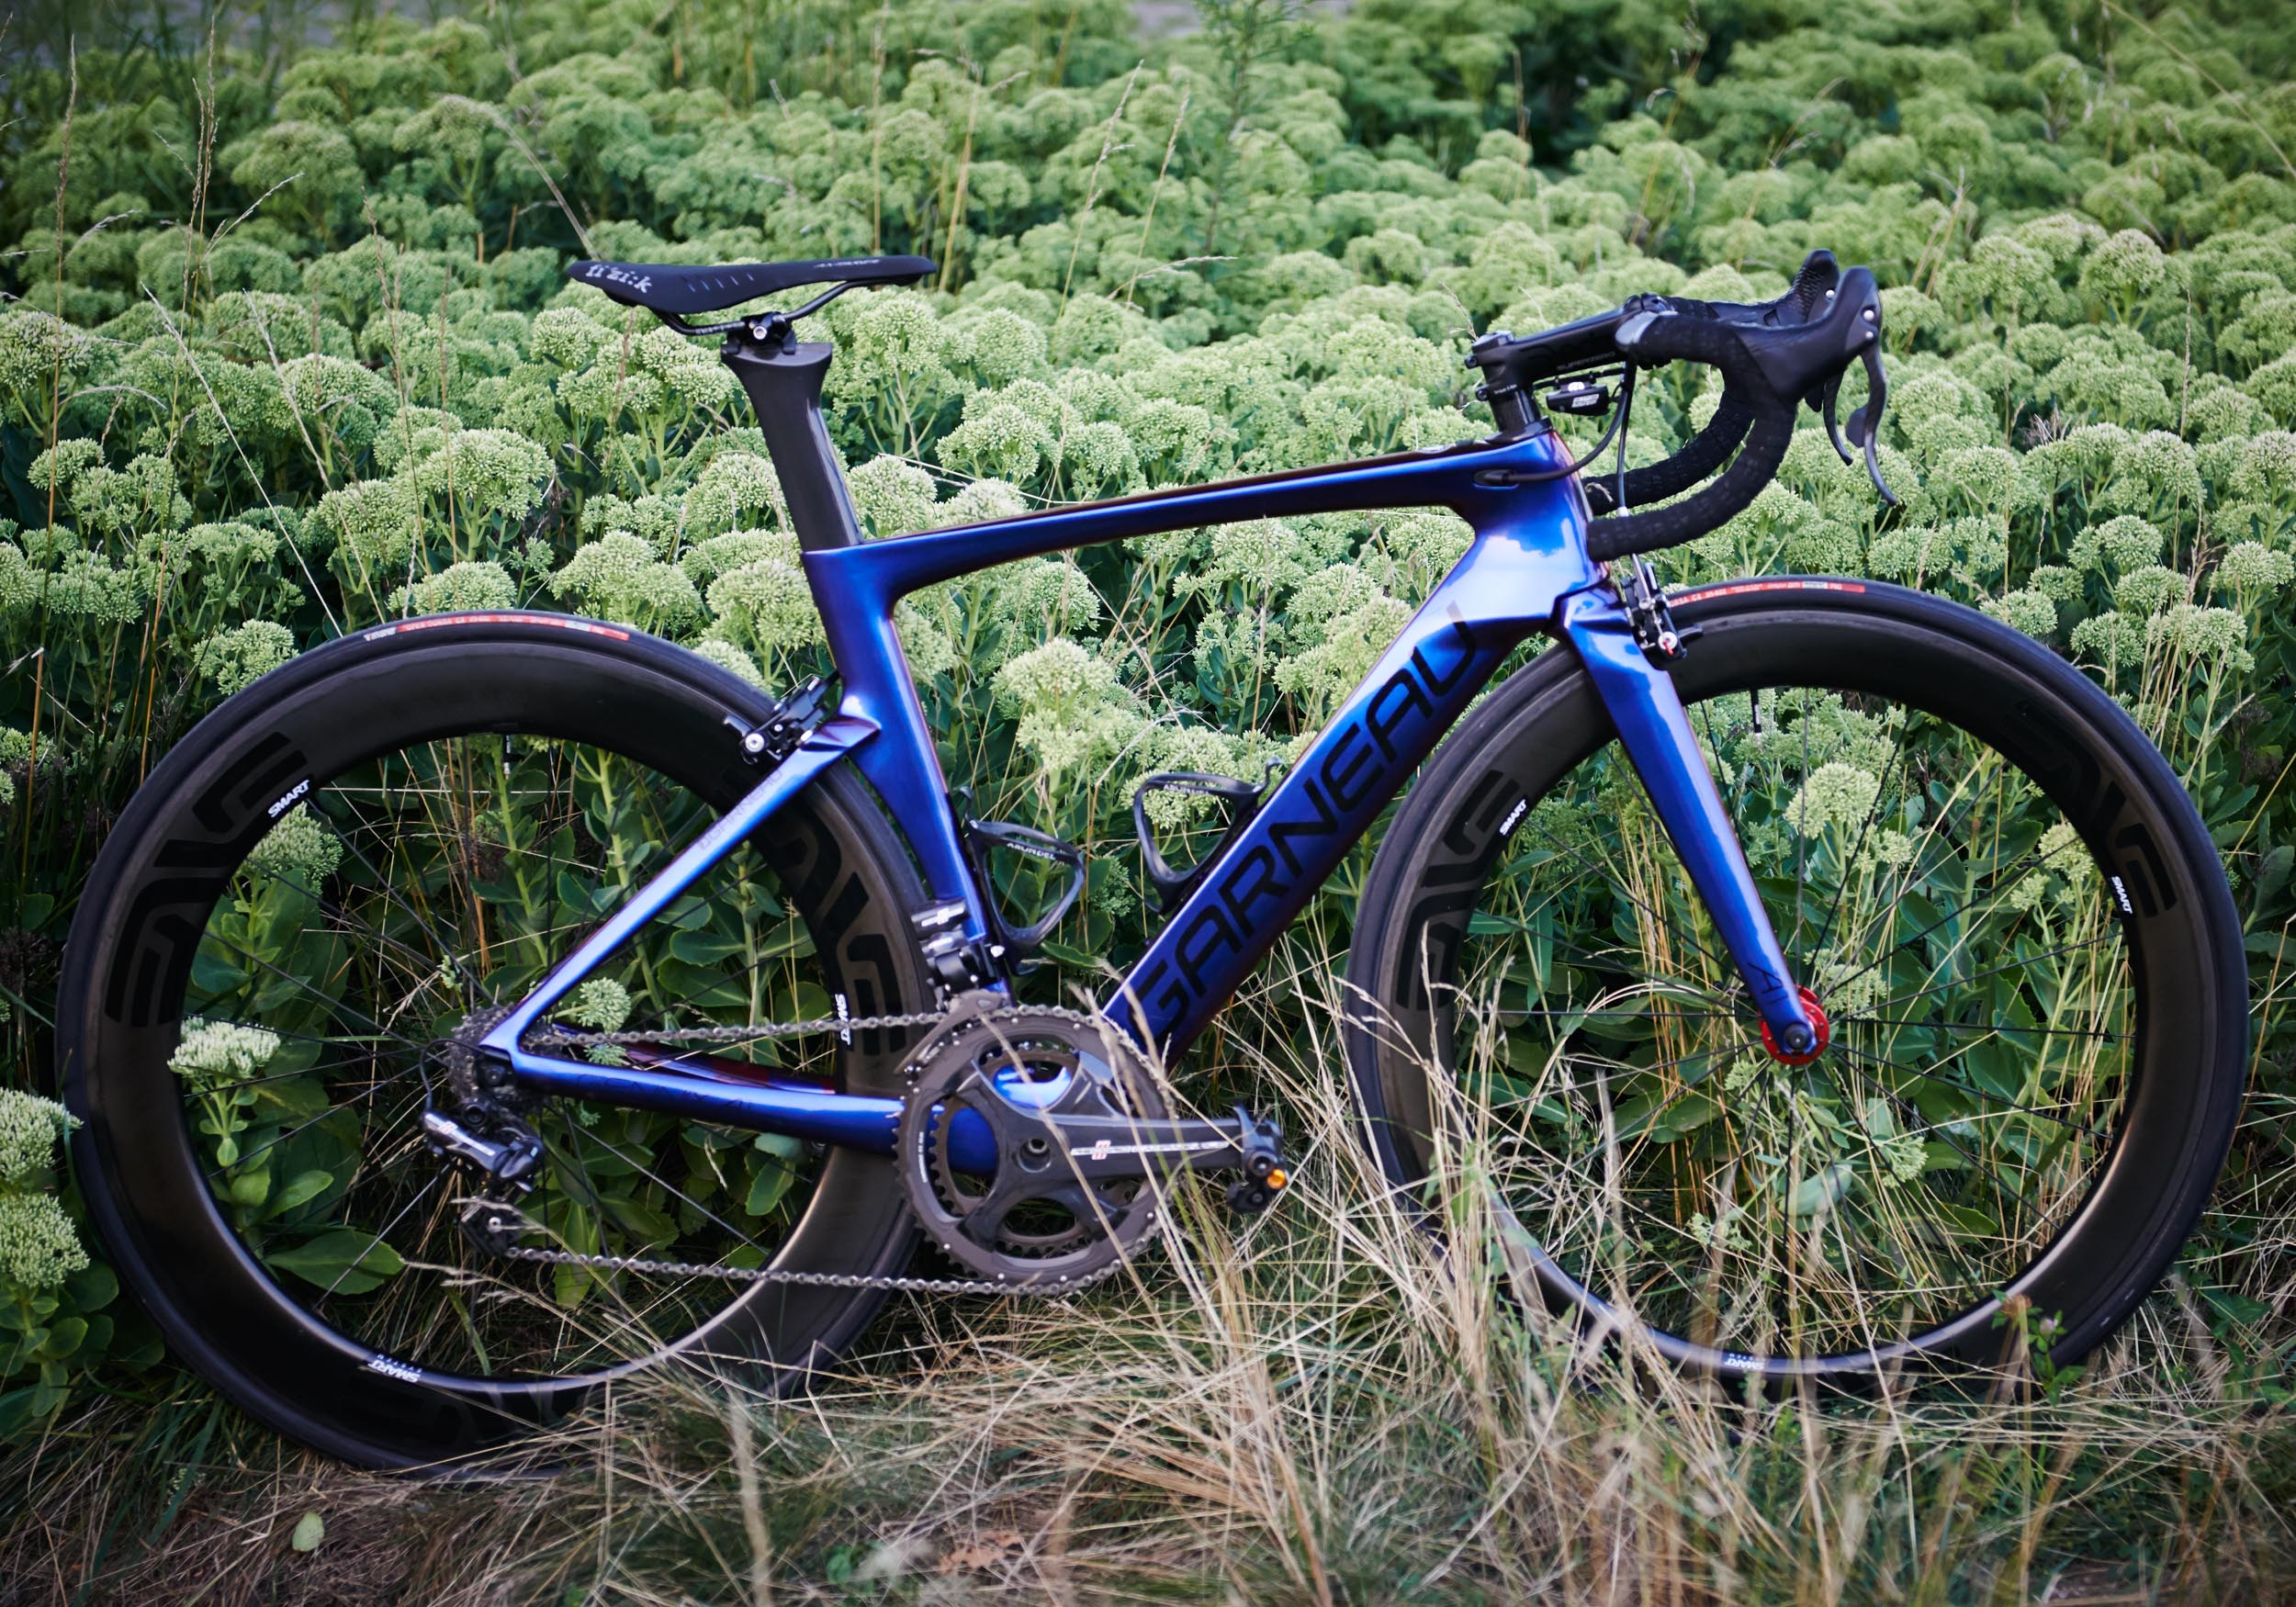 to-be-determined-garneau-a1-bike-review-113.jpg